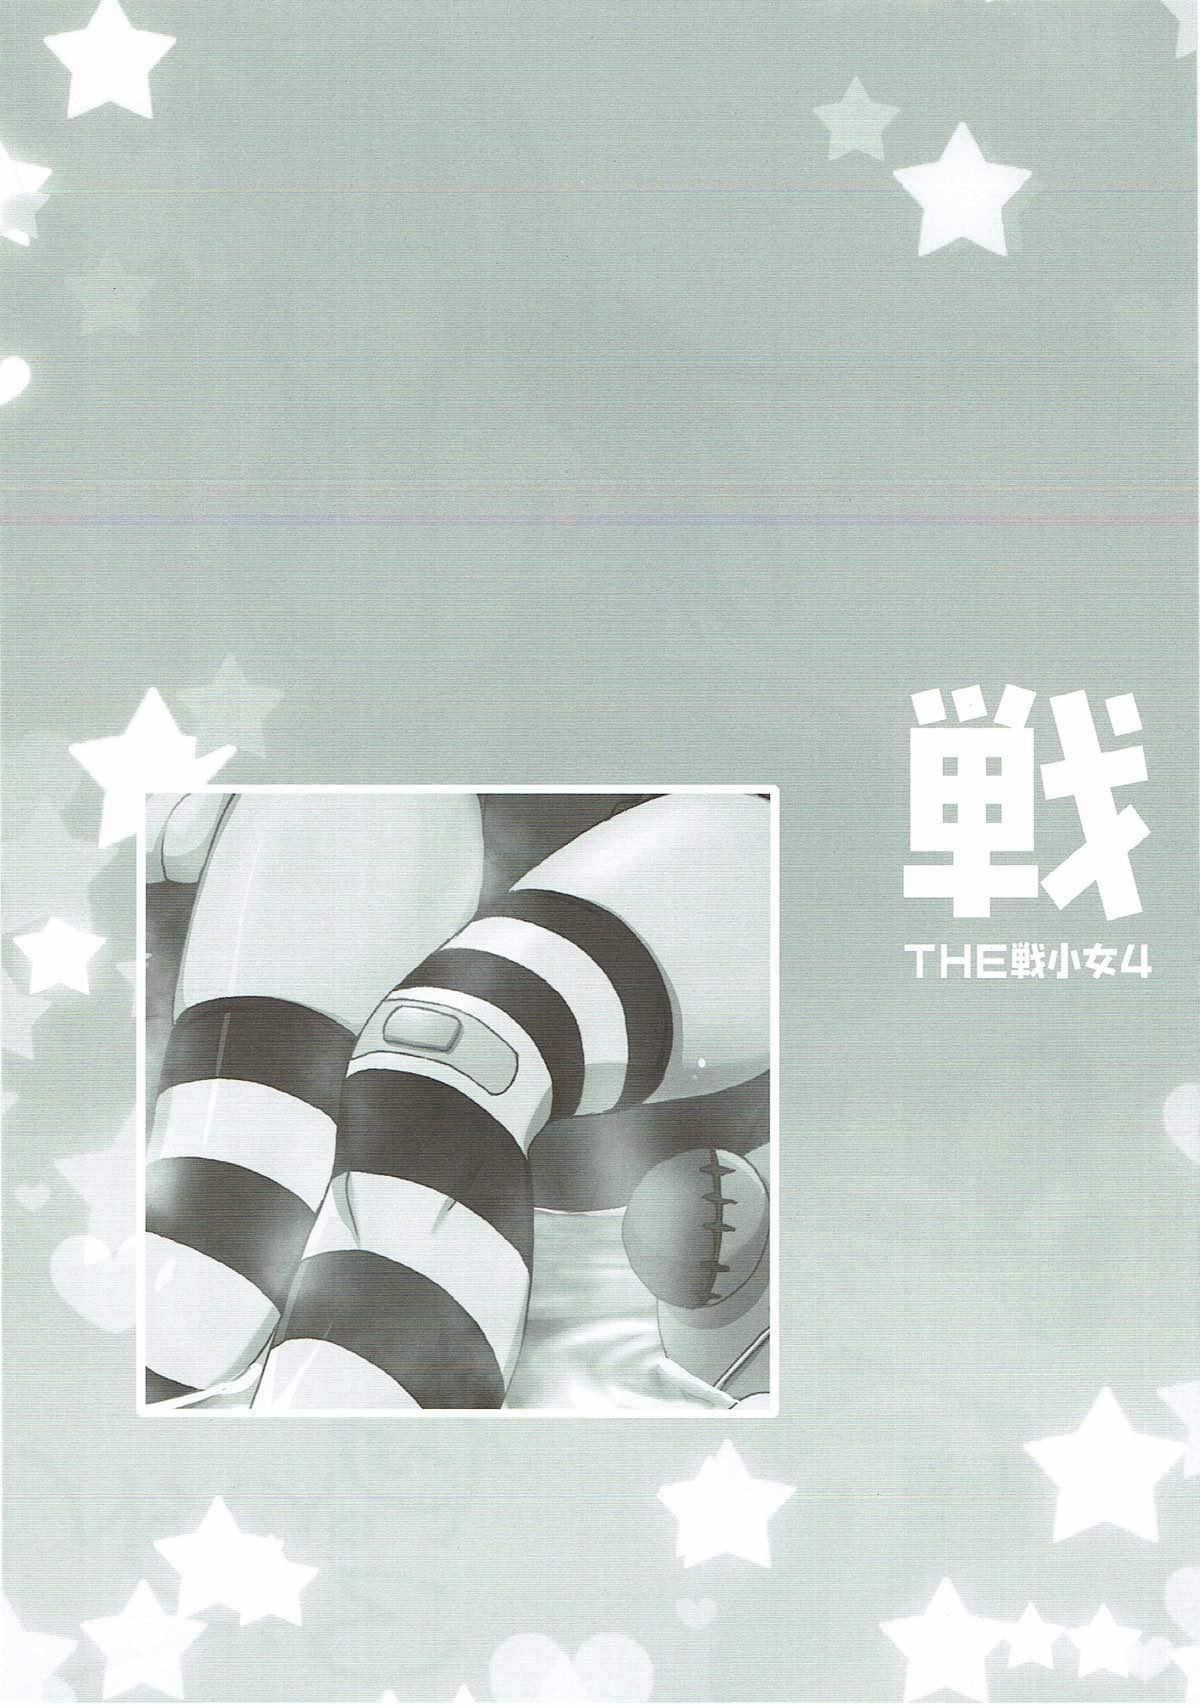 THE Senkome 4 72